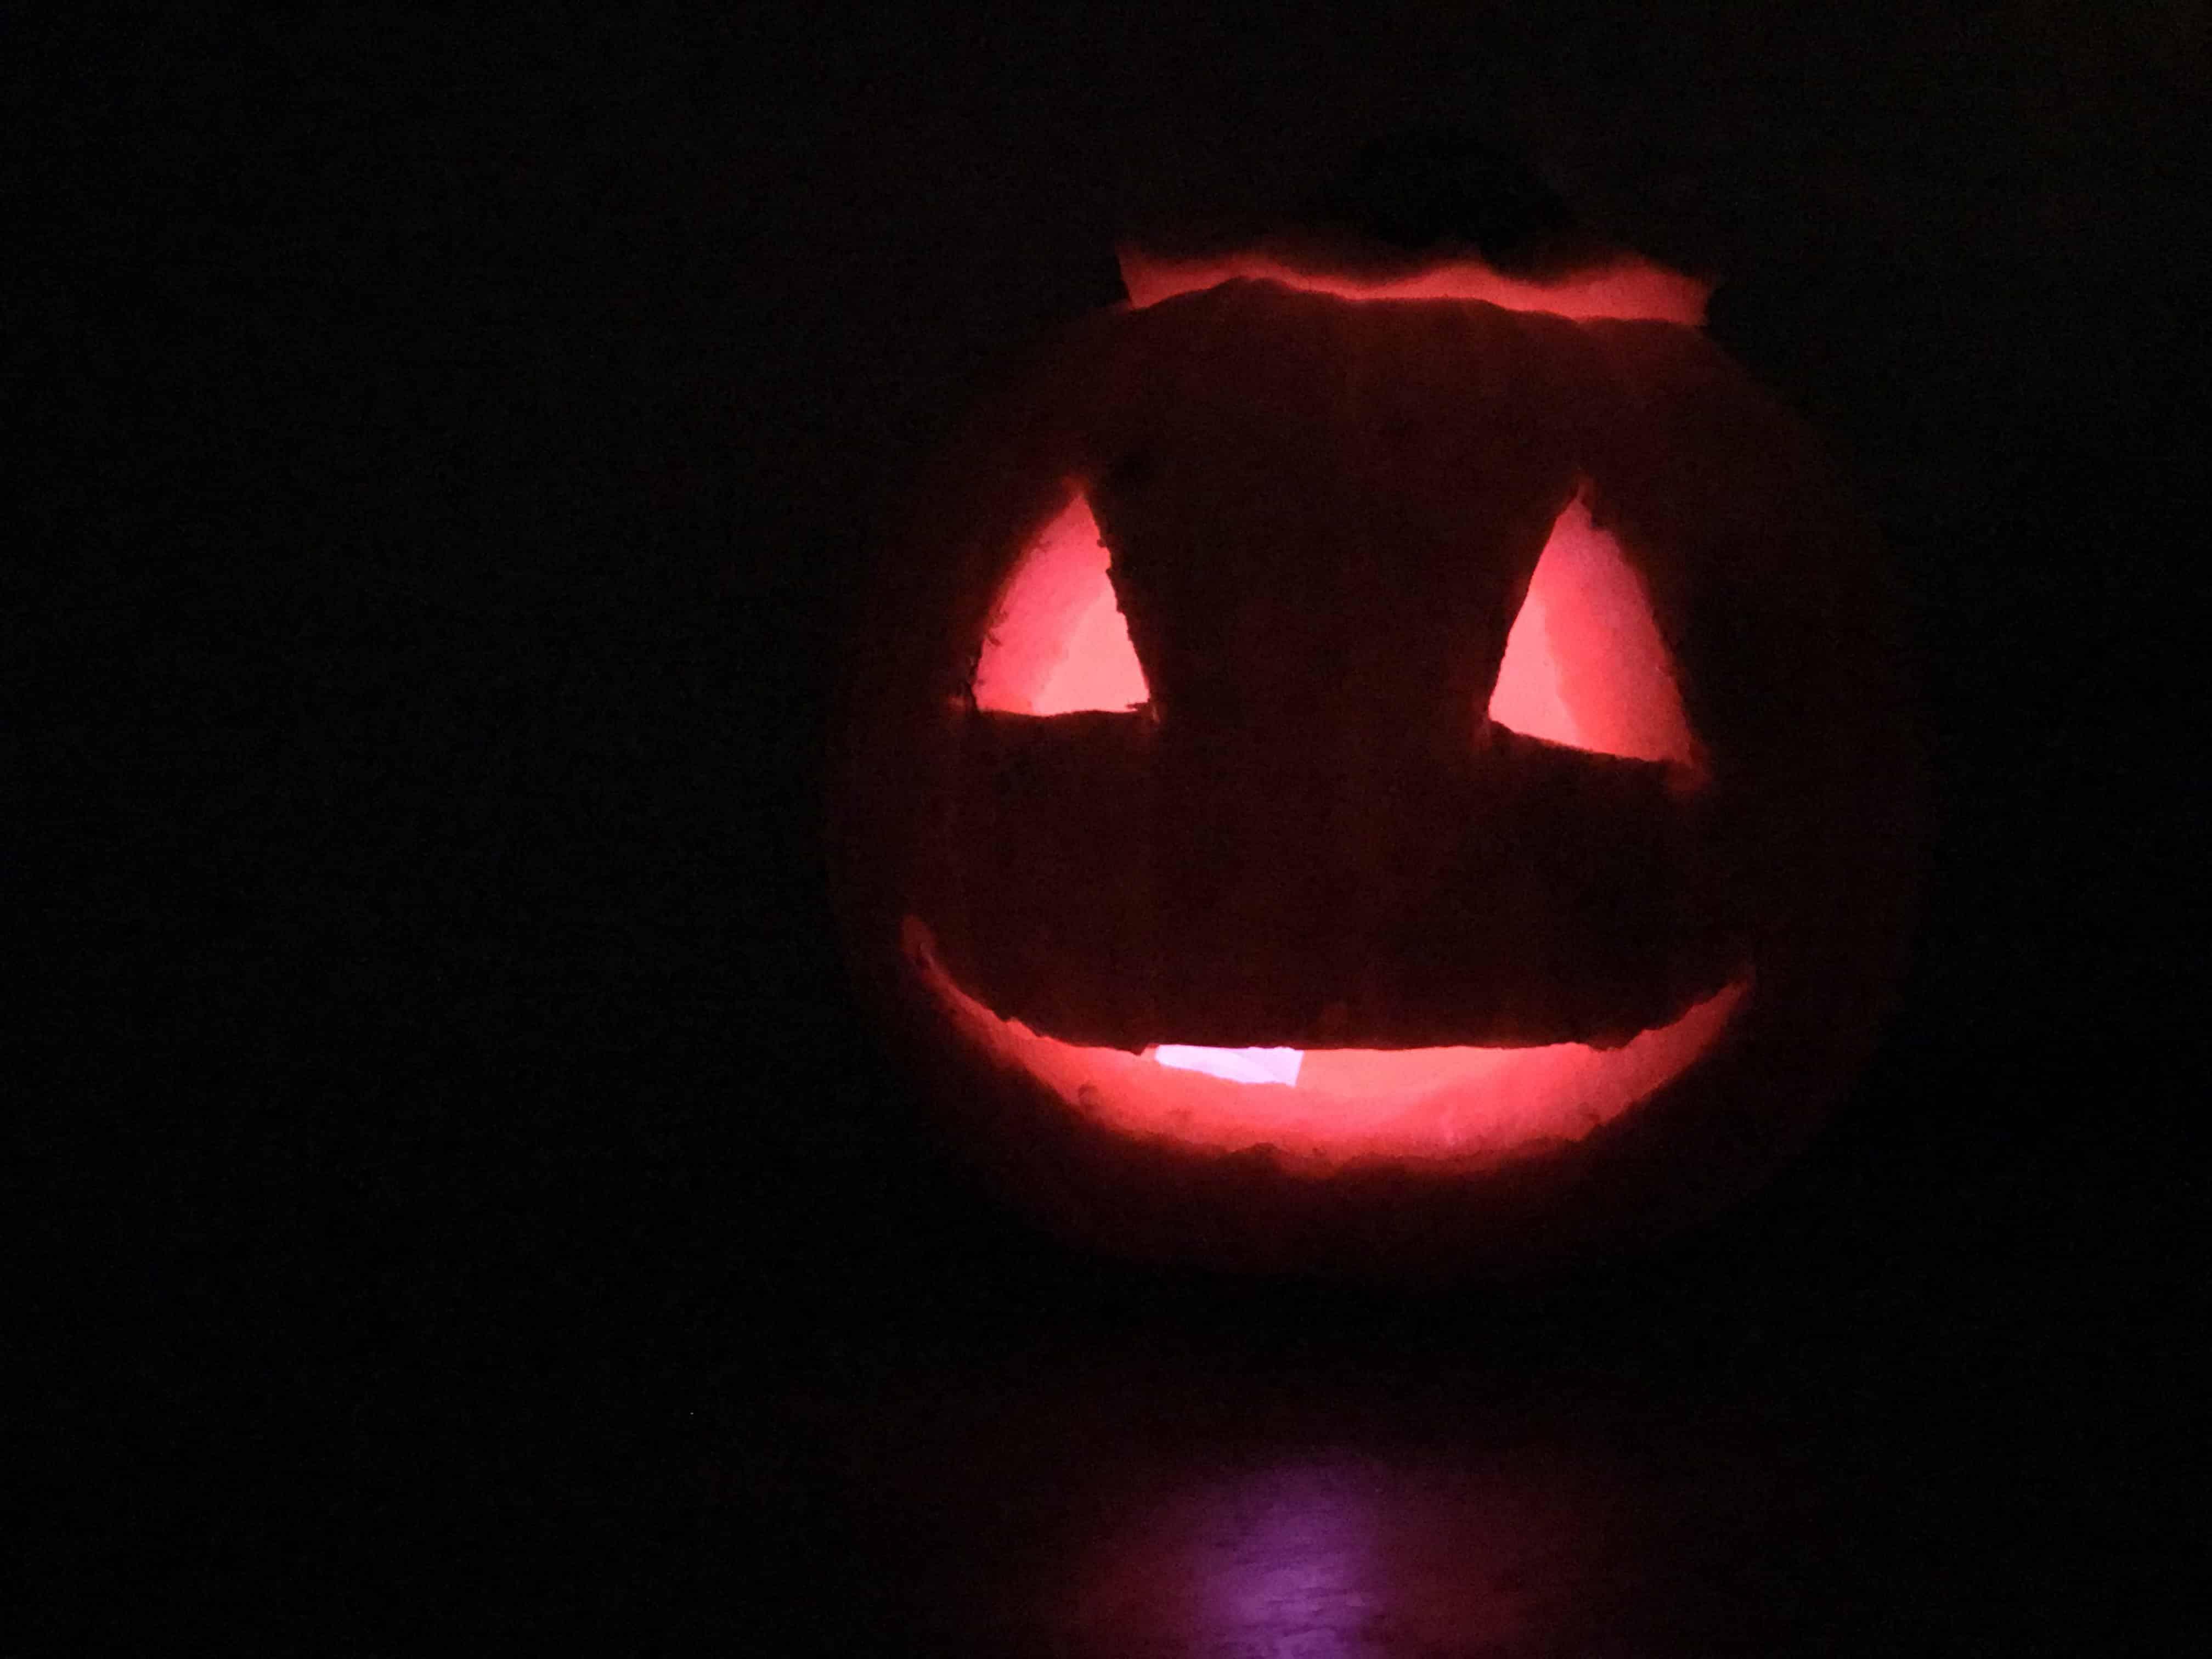 Pumpkin by night